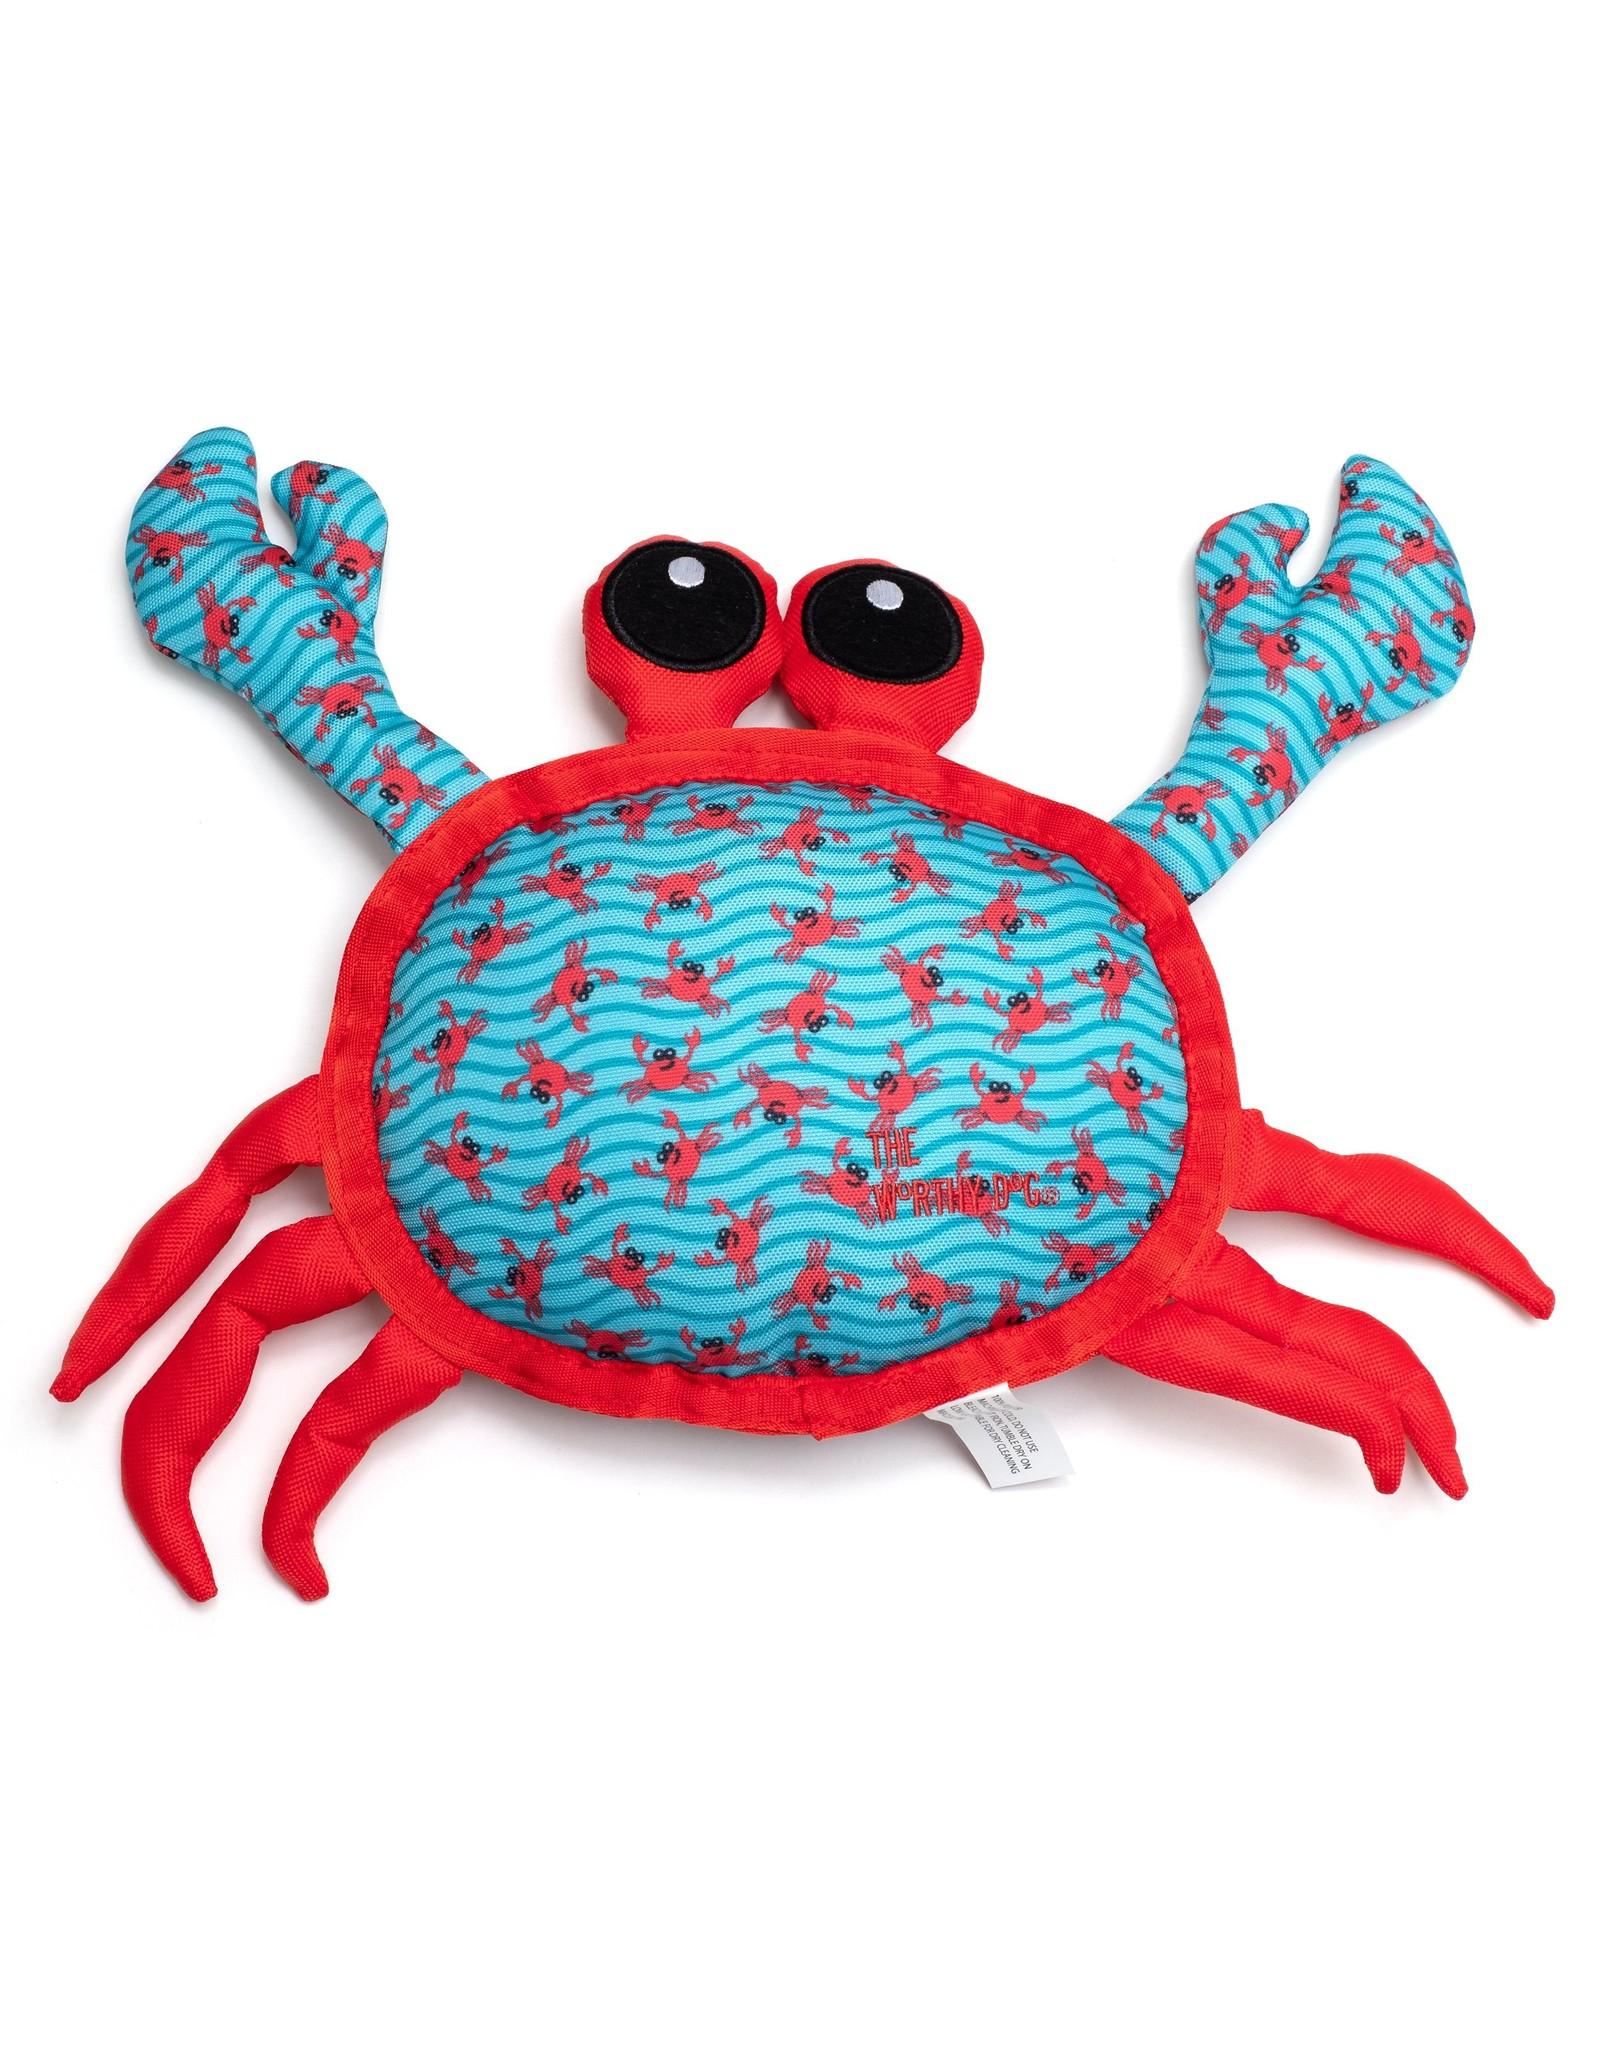 The Worthy Dog Worthy Dog Crab Tough Dog Toys